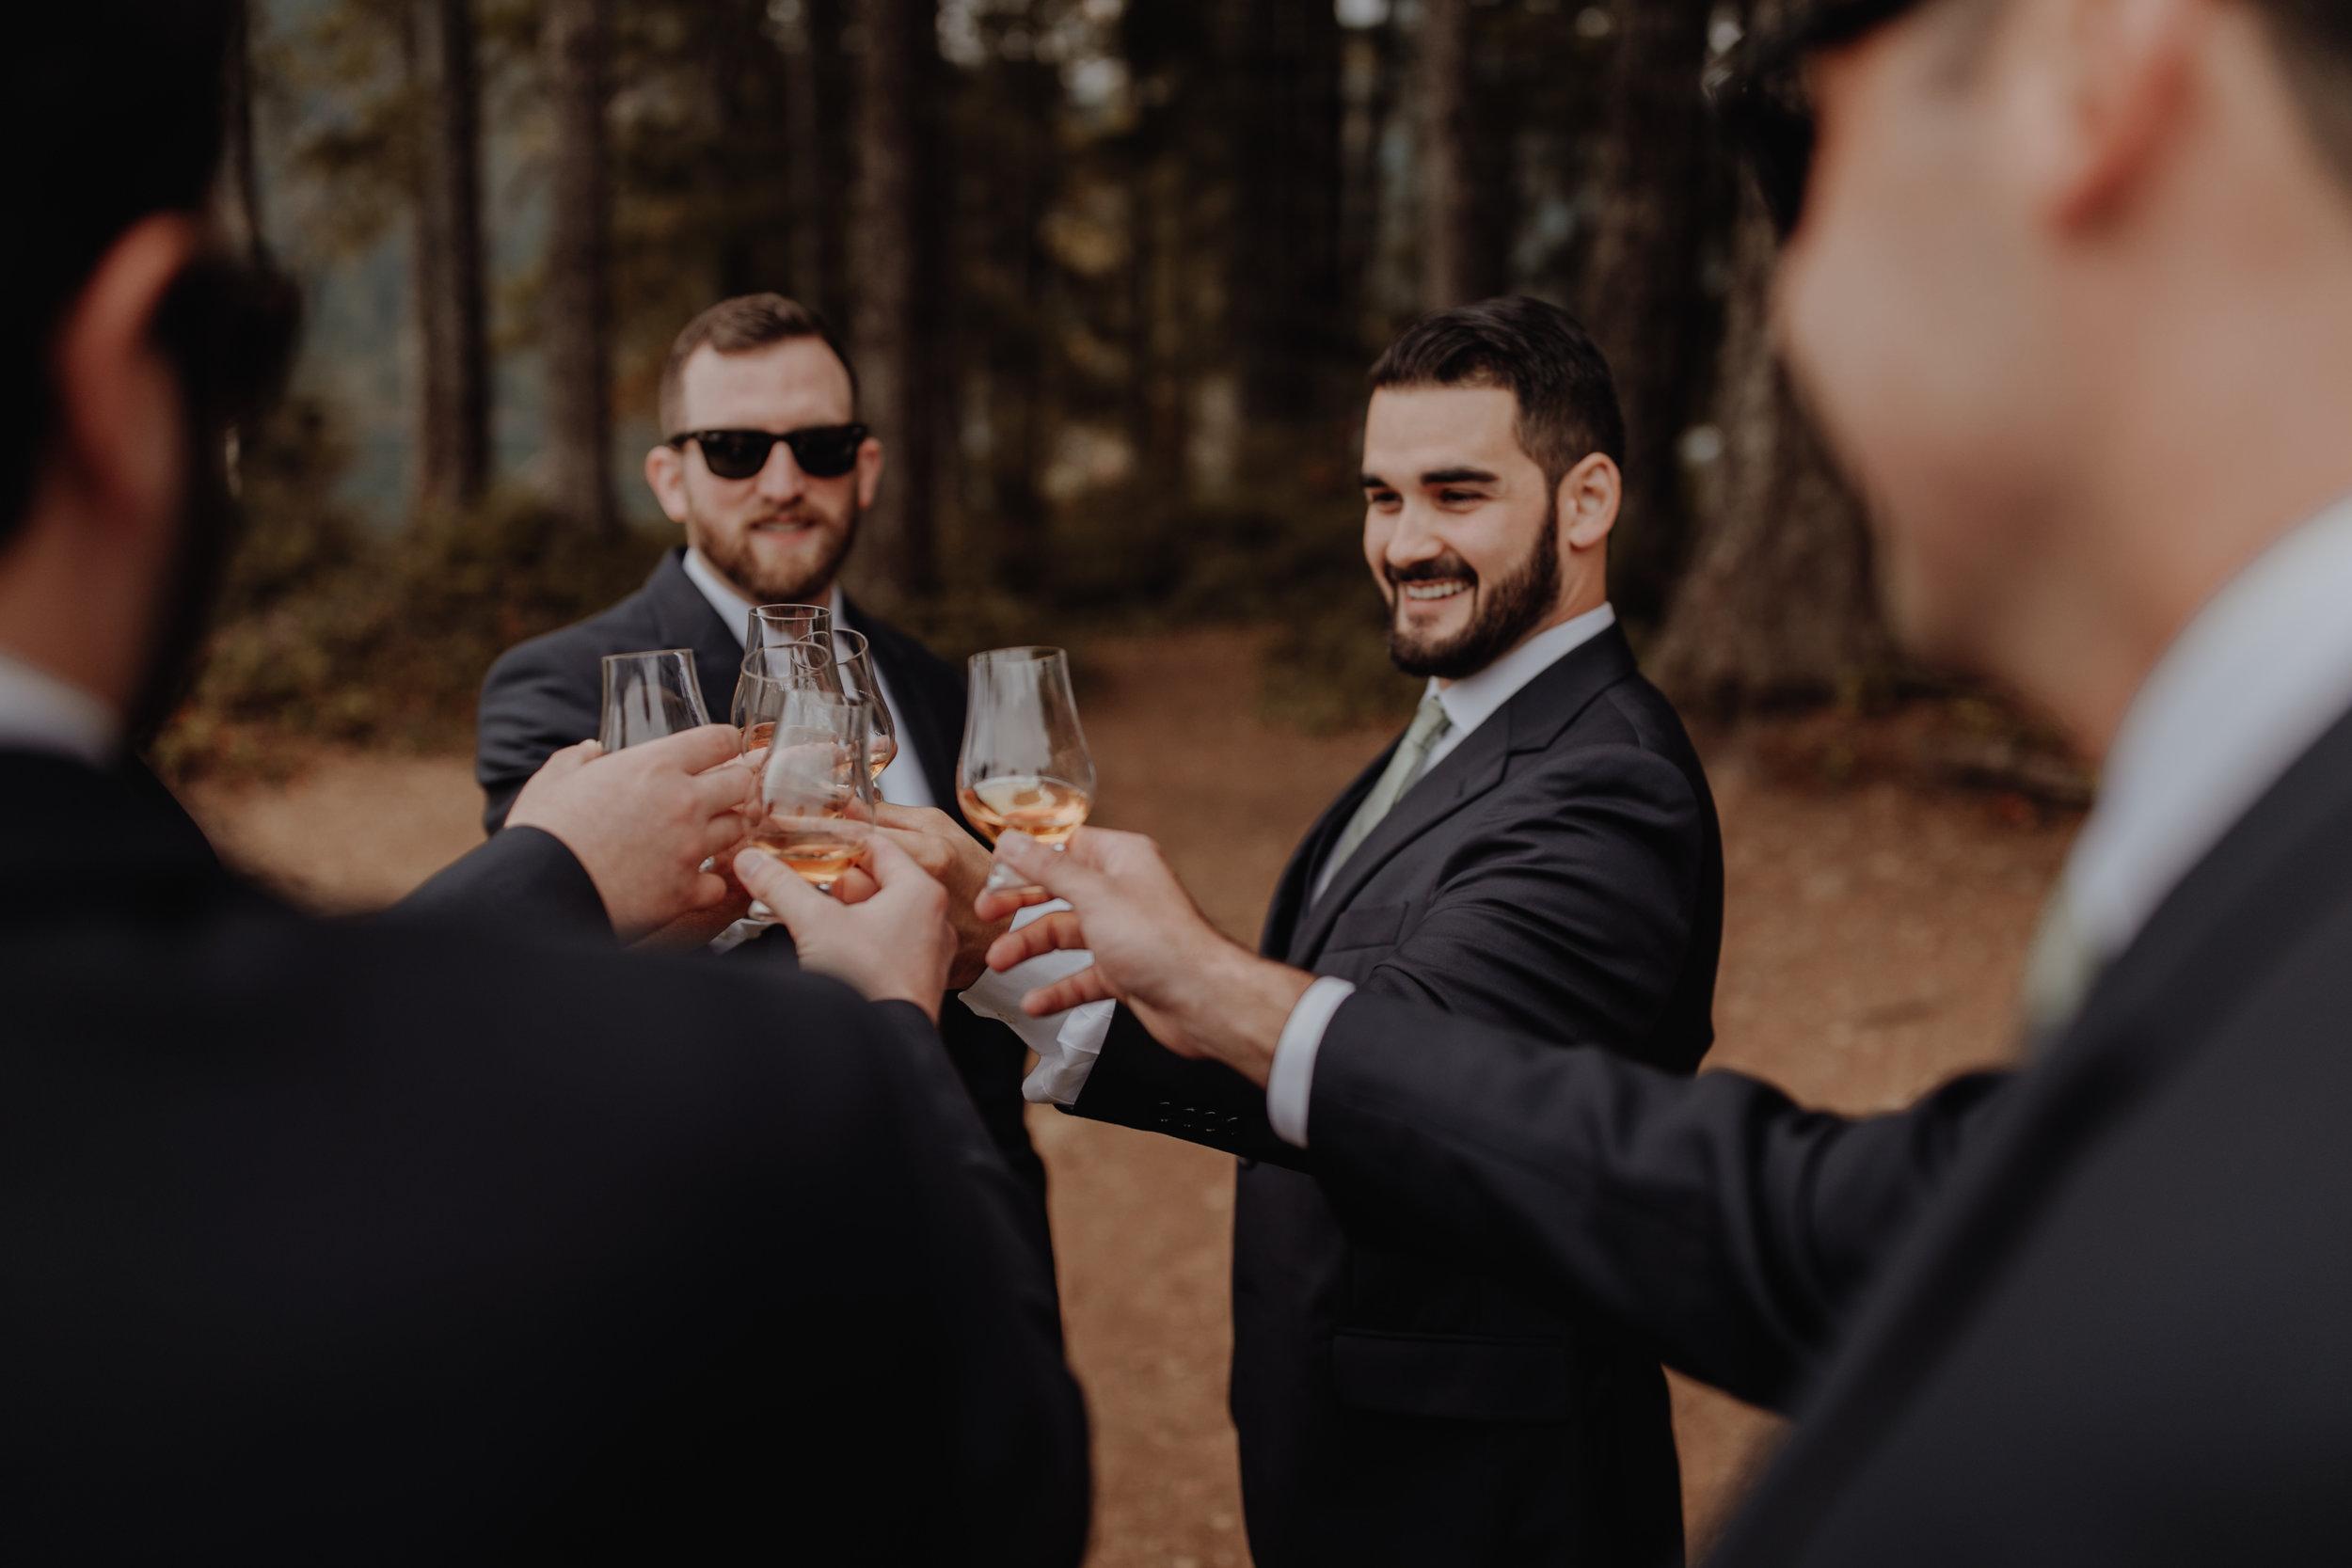 chelsea_jordan_wedding-43.jpg